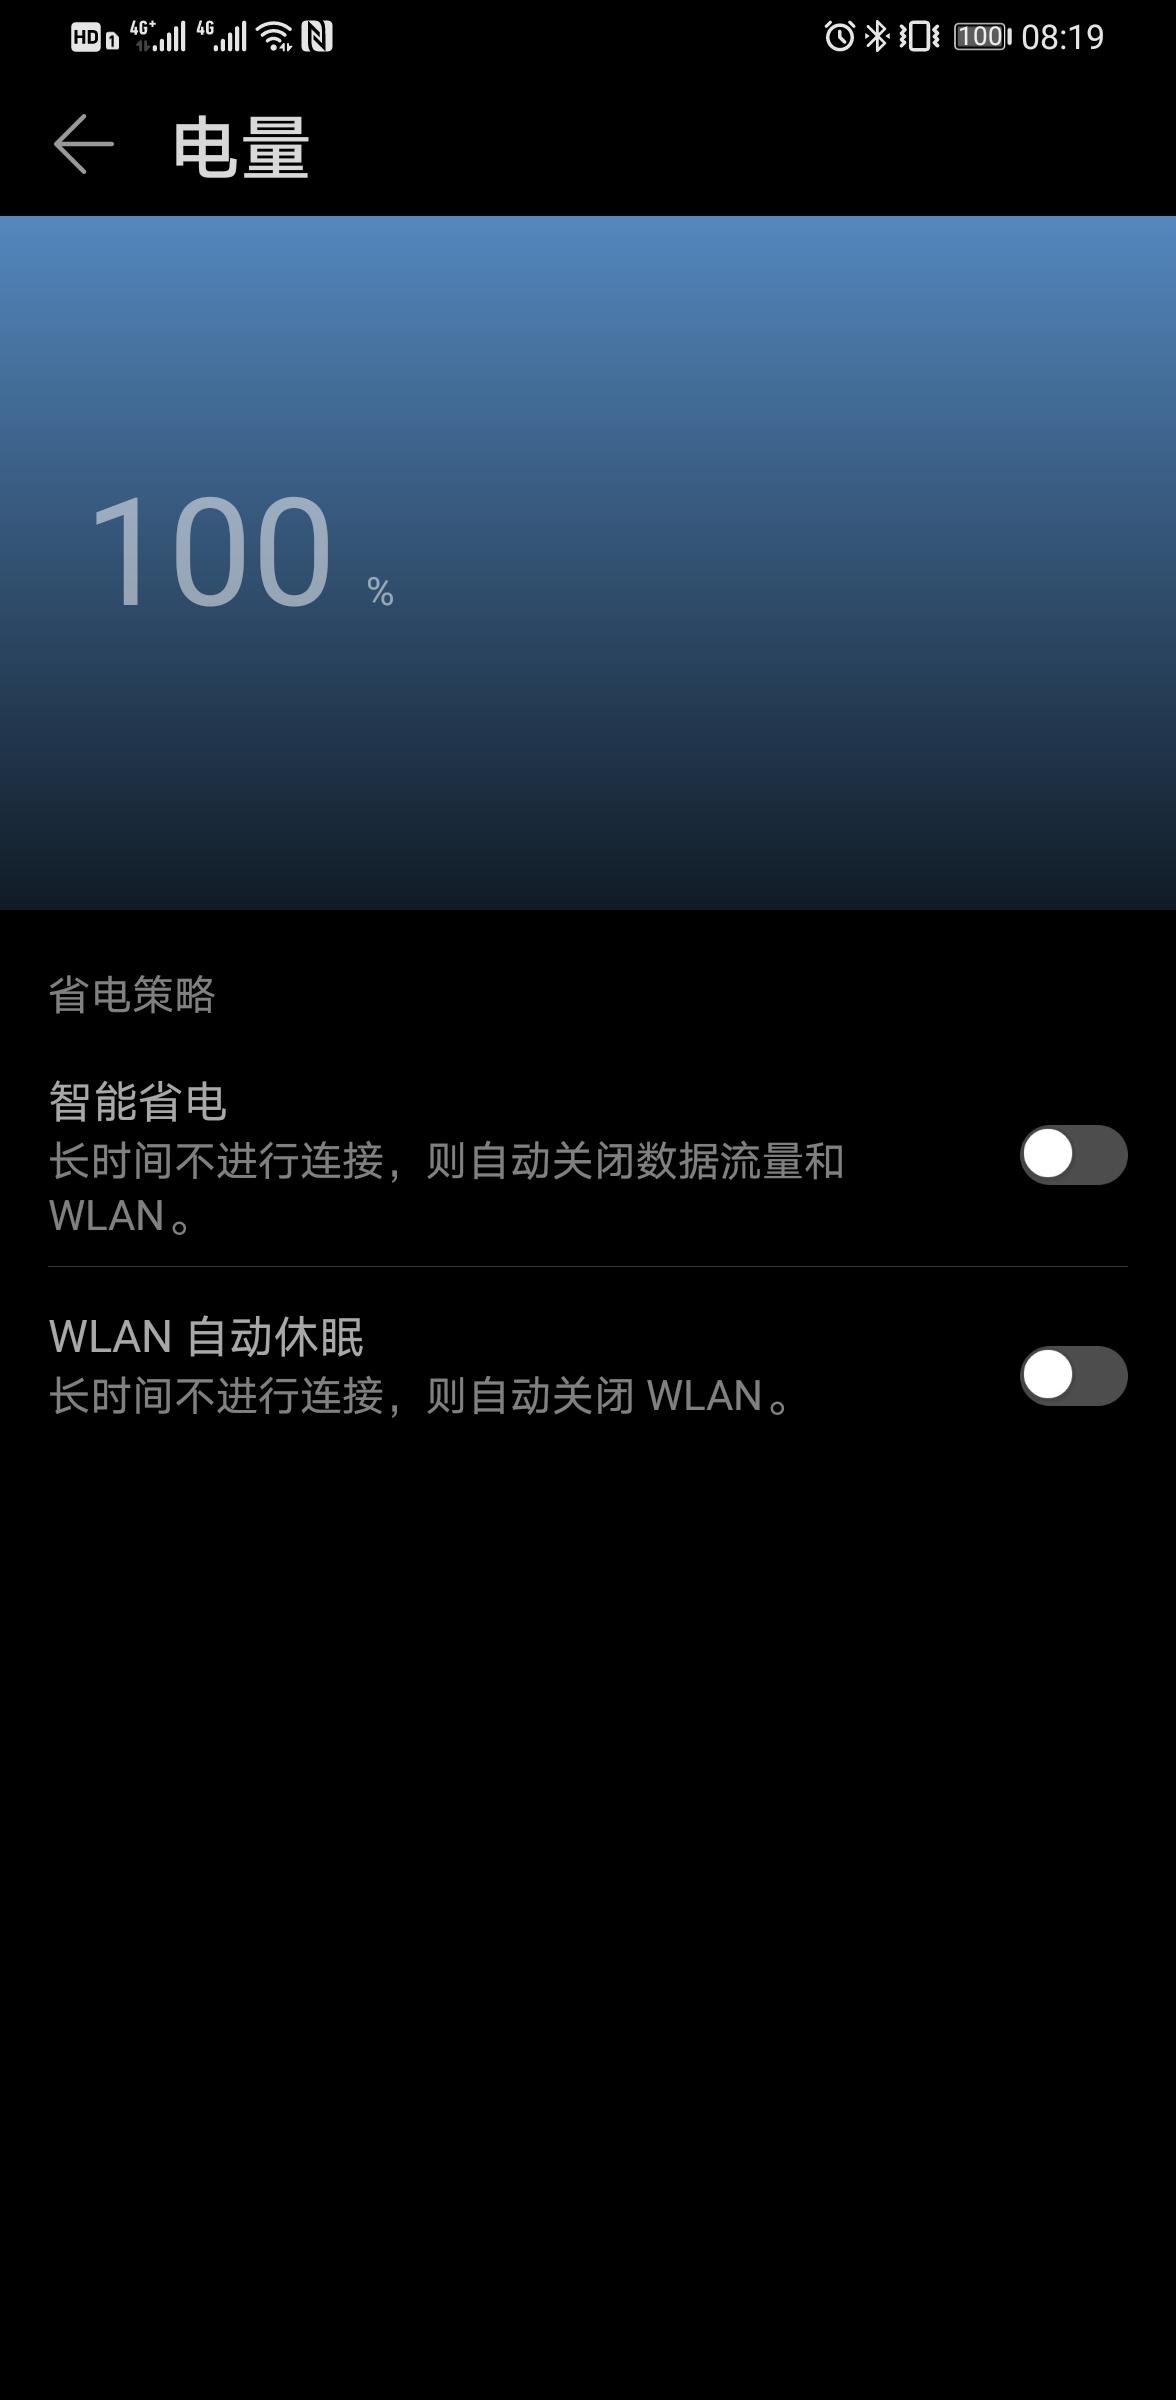 Screenshot_20200410_081914_com.huawei.smarthome.jpg